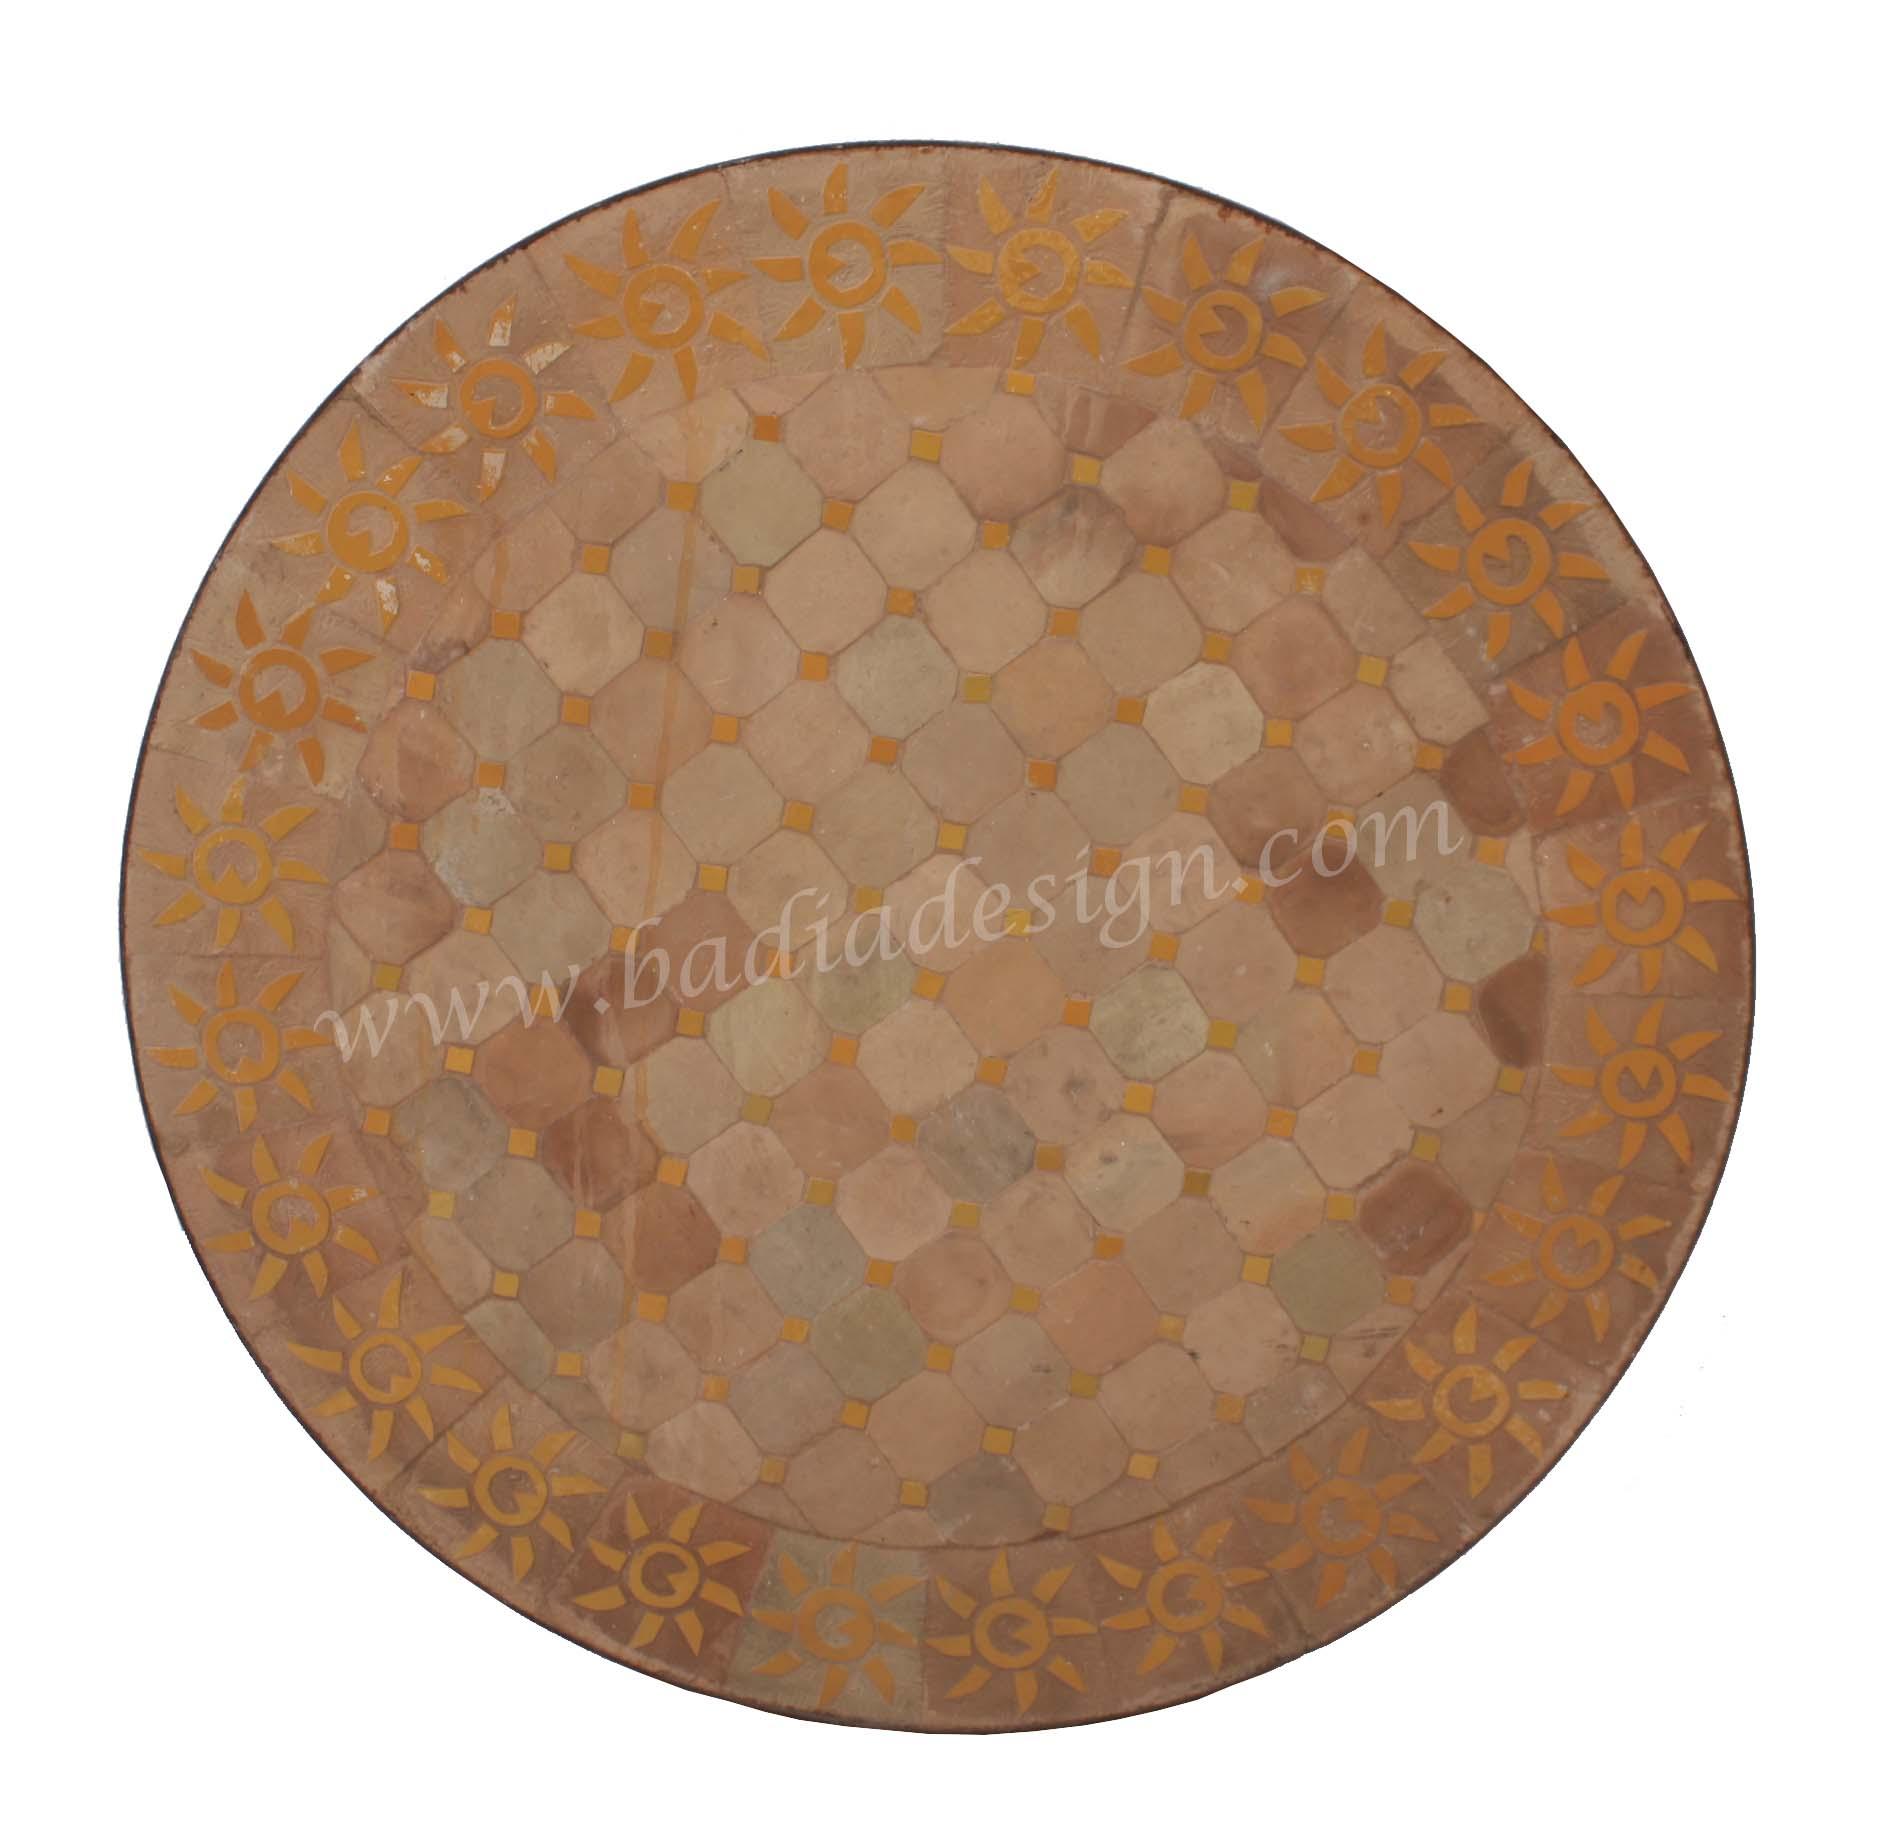 moroccan-table-top-new-york-mtr251.jpg